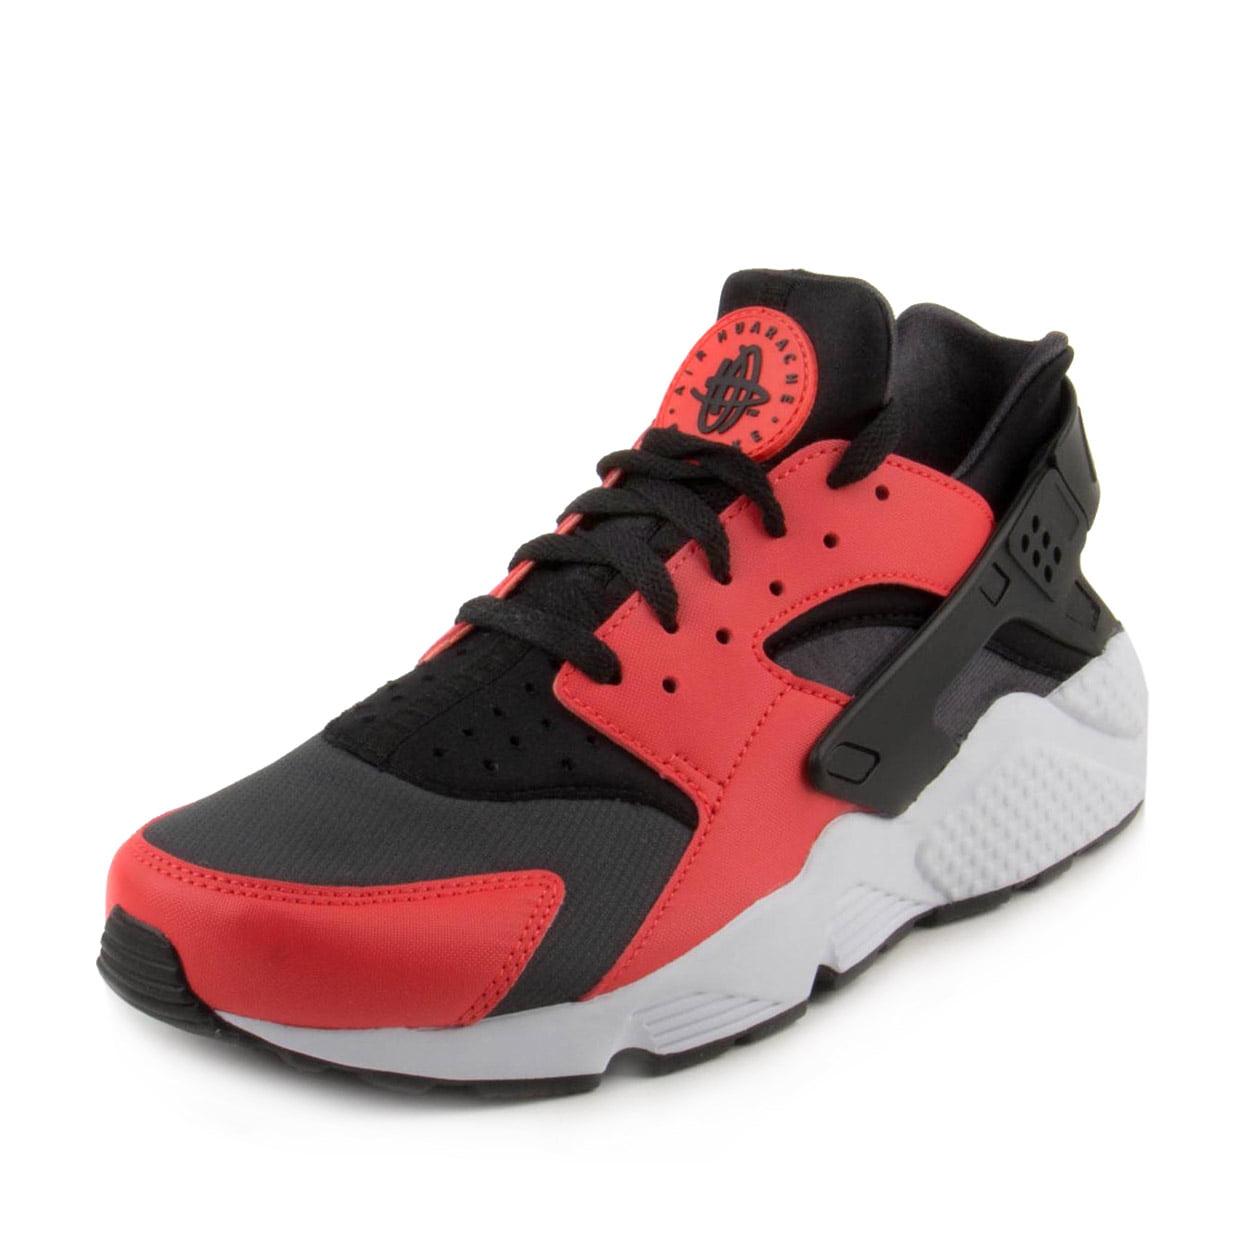 Nike Mens Air Huarache Max Orange/Black 318429-800